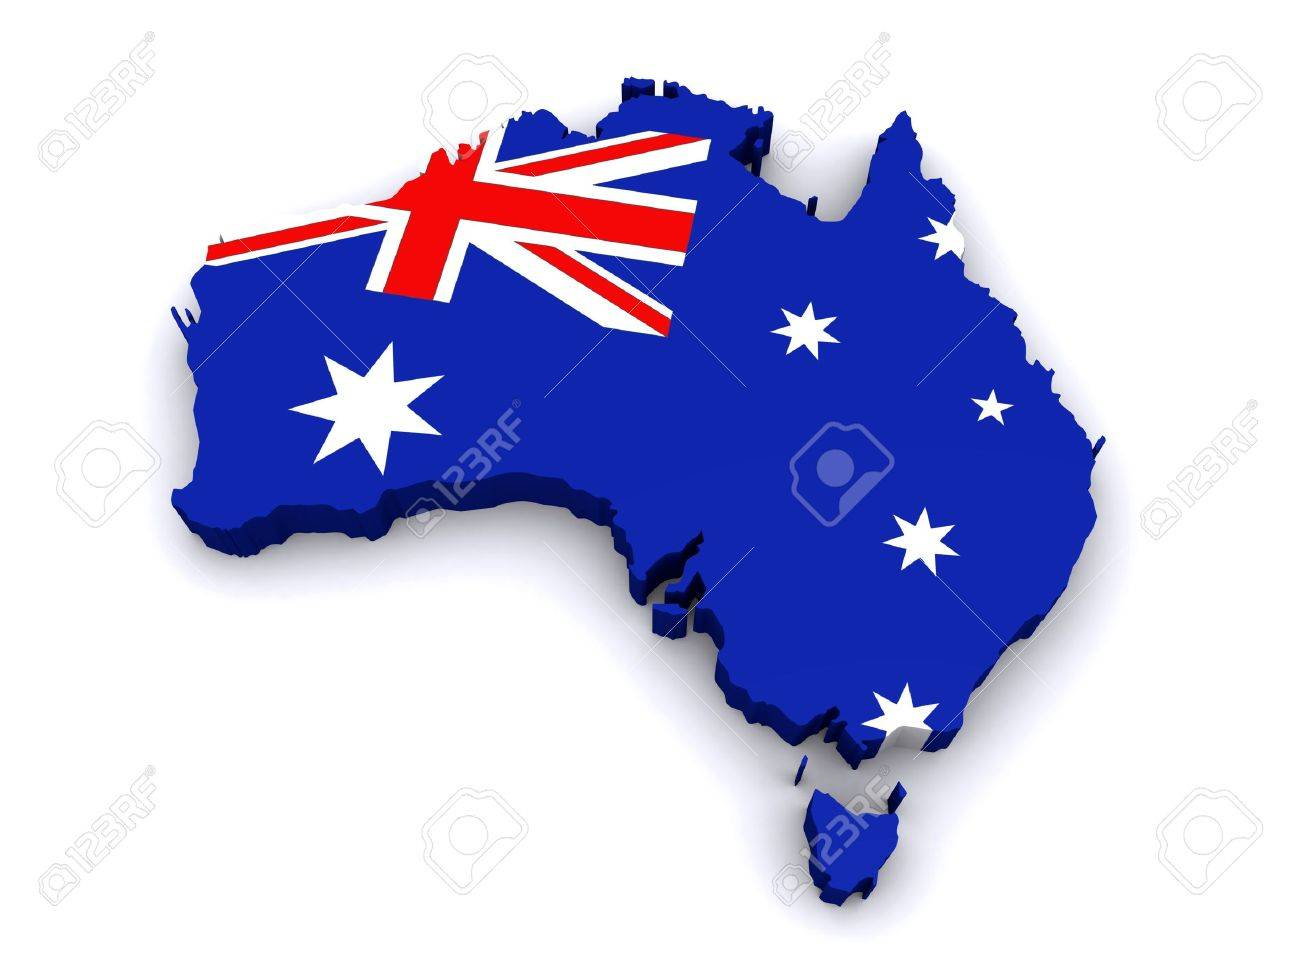 Free 3d Map Of Australia.3d Map Of Australia